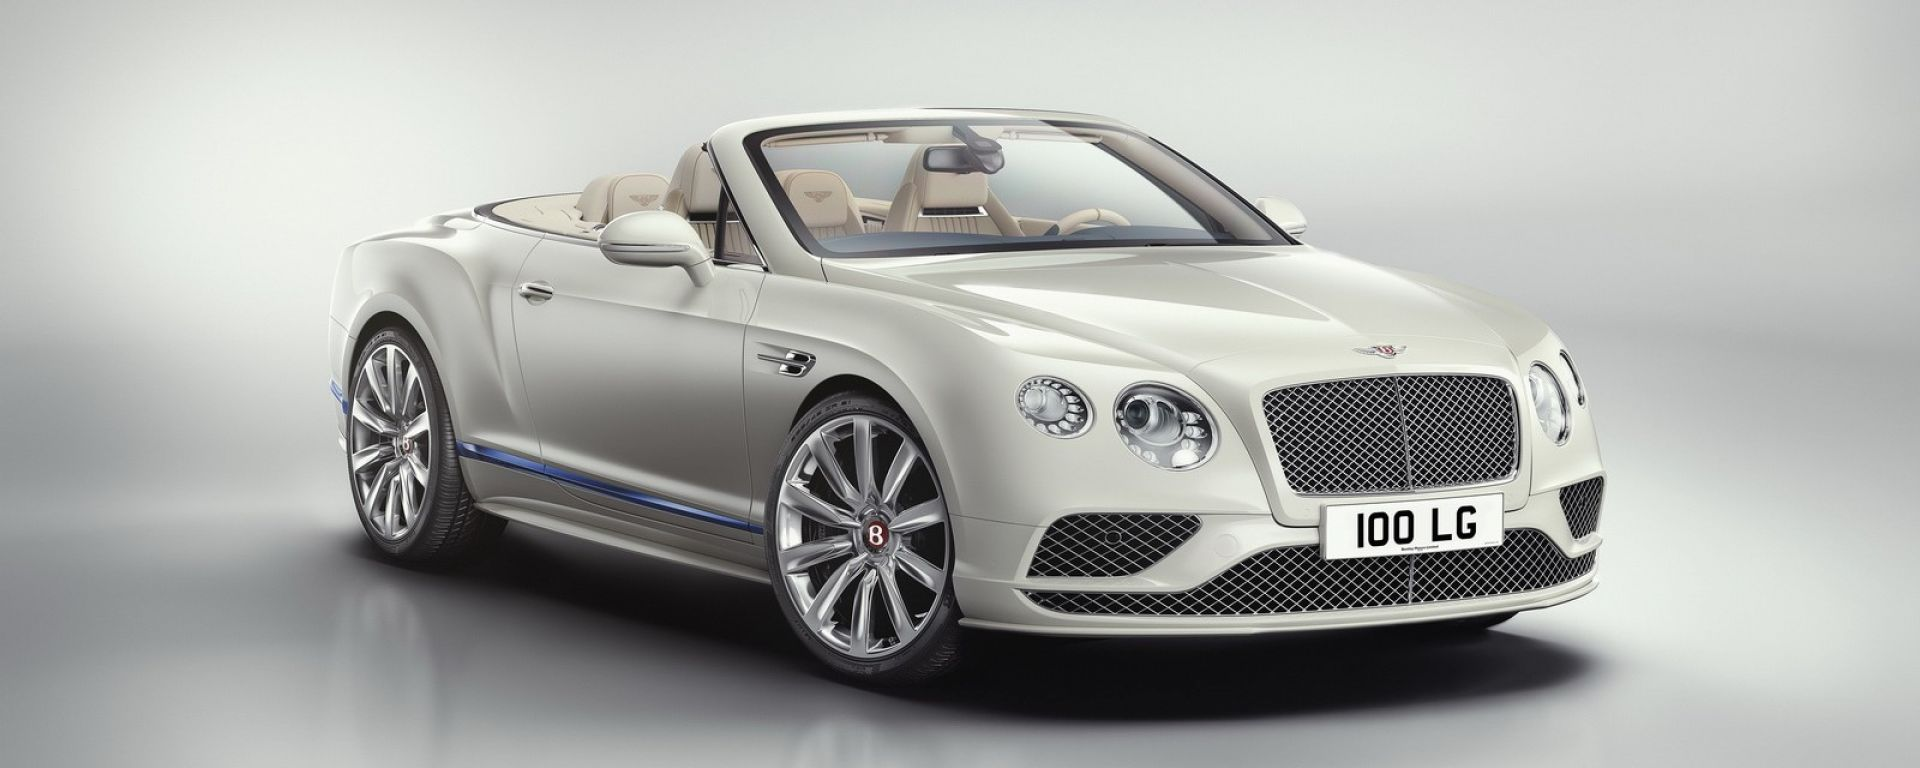 Bentley Continental GT Galene Edition: cabrio per l'estate?